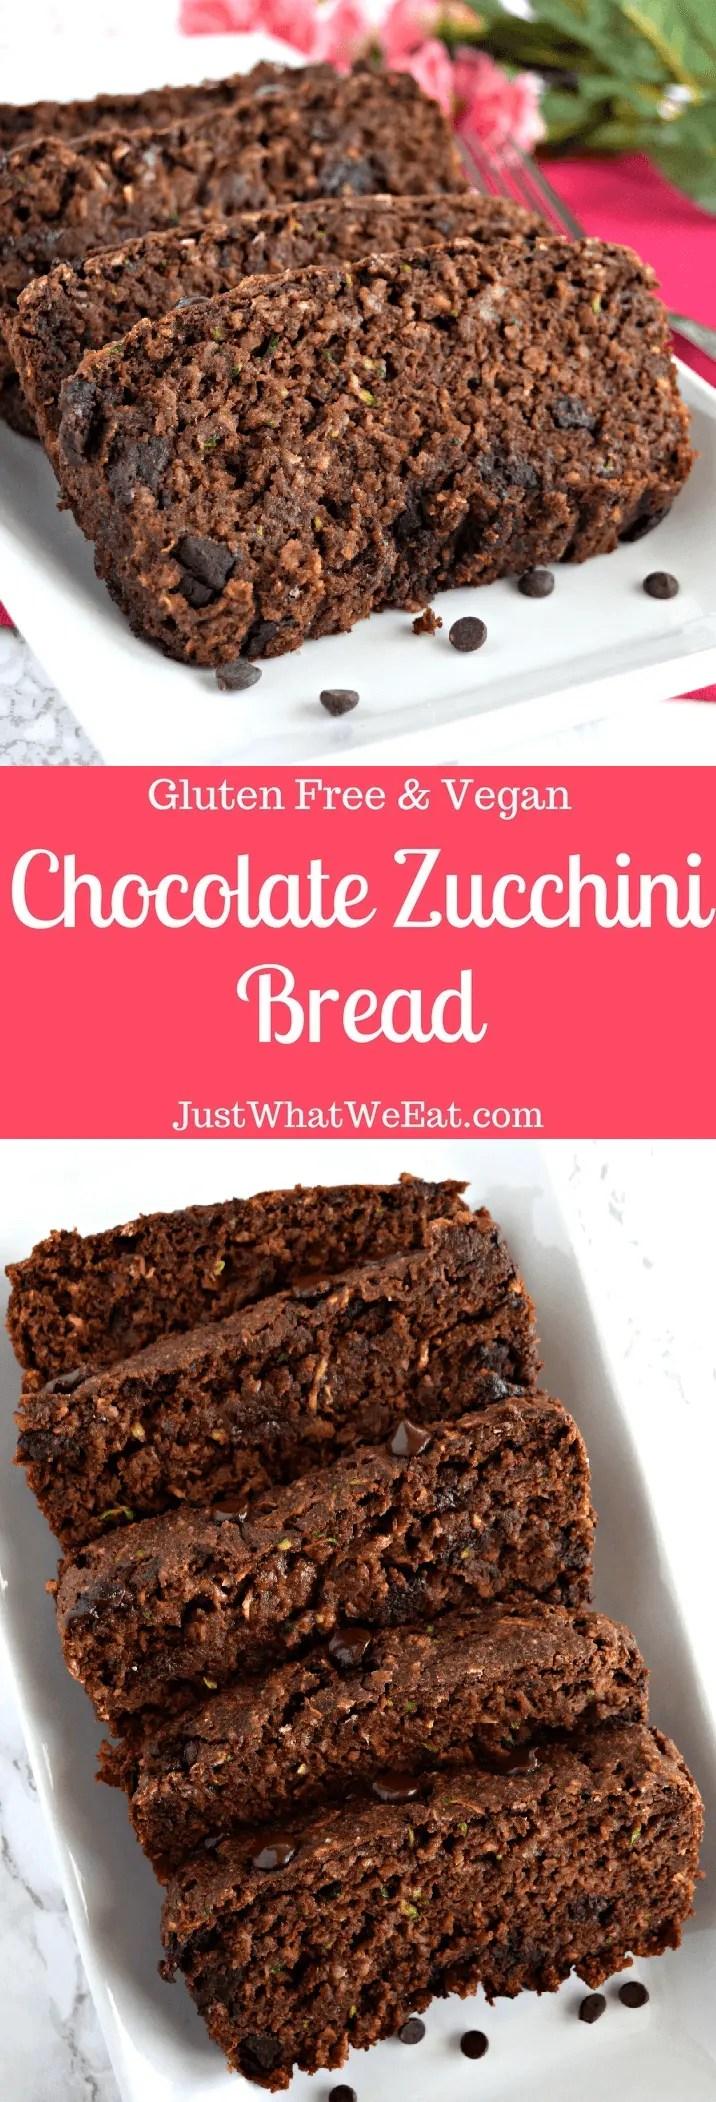 Chocolate Zucchini Bread - Gluten Free & Vegan